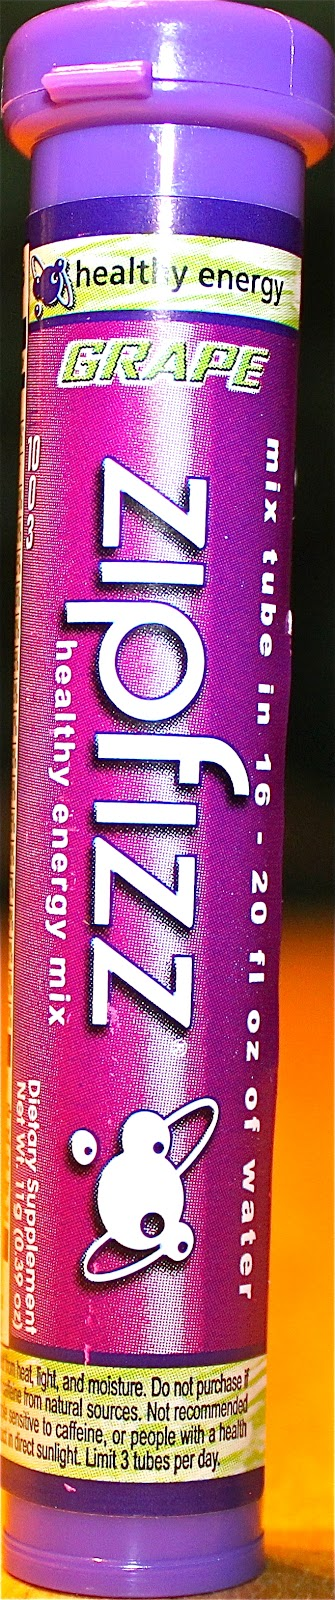 ADDICTED 2 ENERGY!: REVIEW OF ZIPFIZZ ORANGE SODA